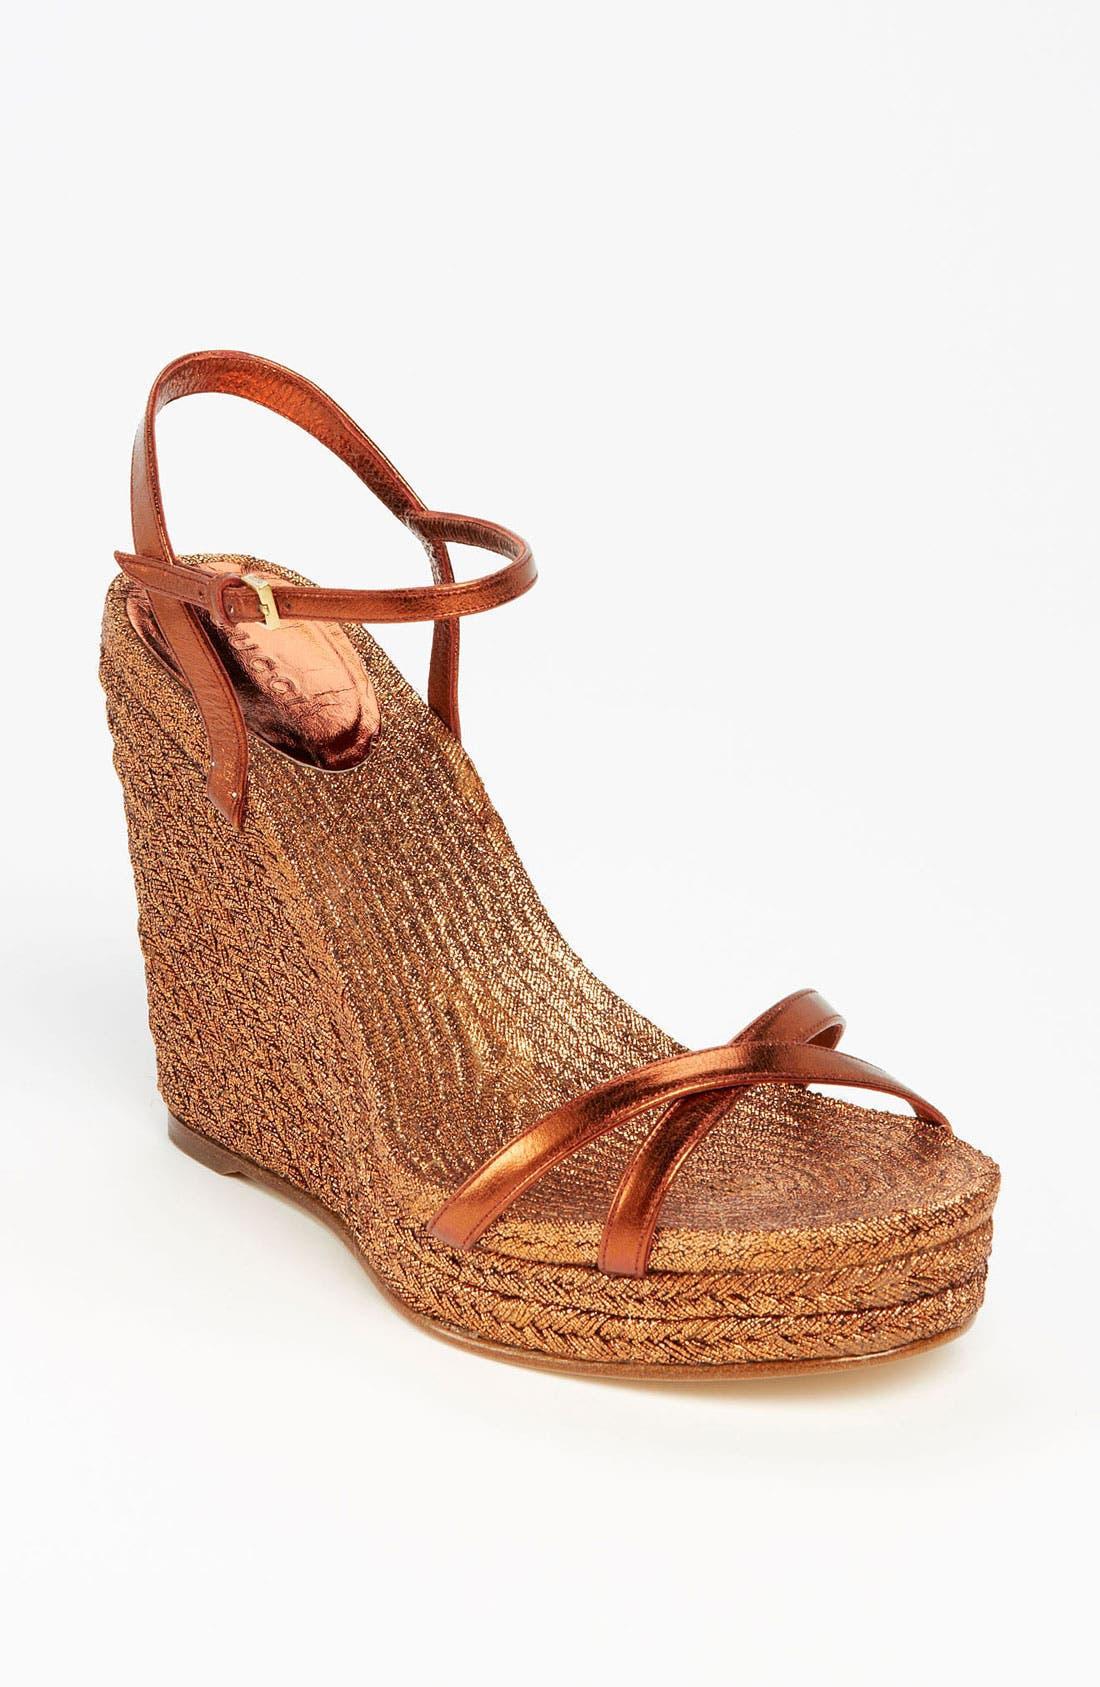 Main Image - Gucci 'Lia' Espadrille Sandal